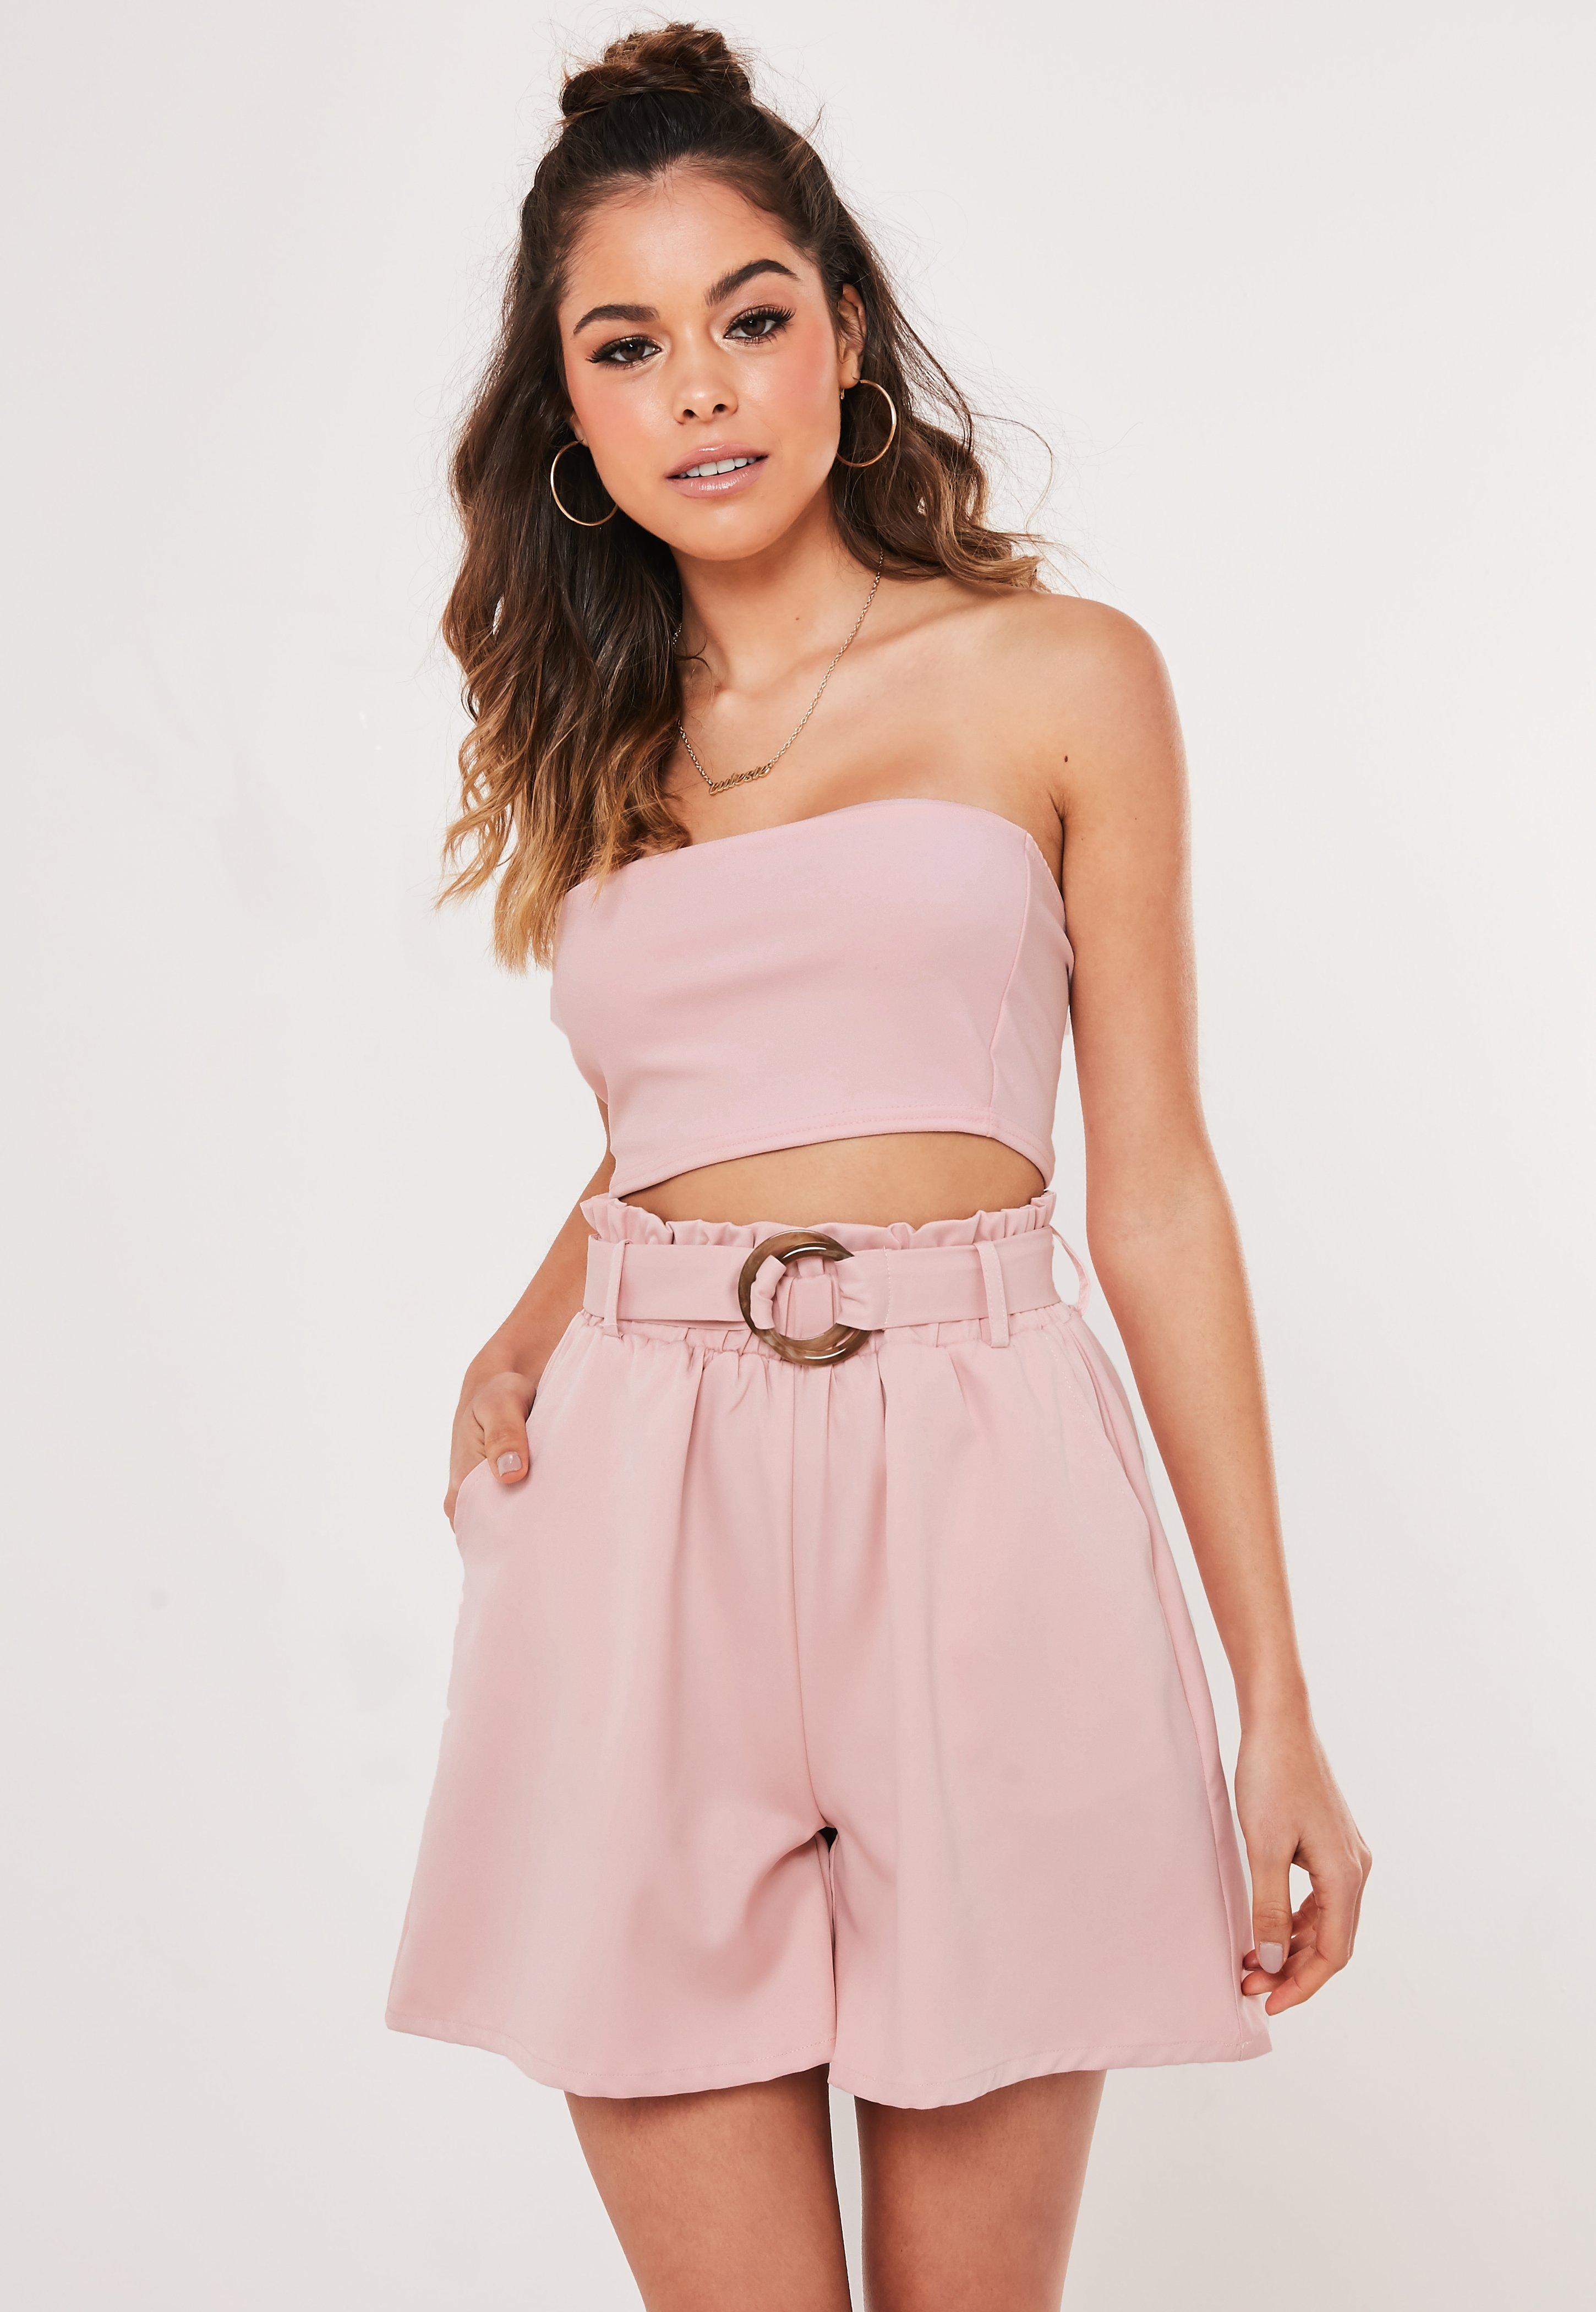 Paperbag Shorts bauchfreier Top rosa